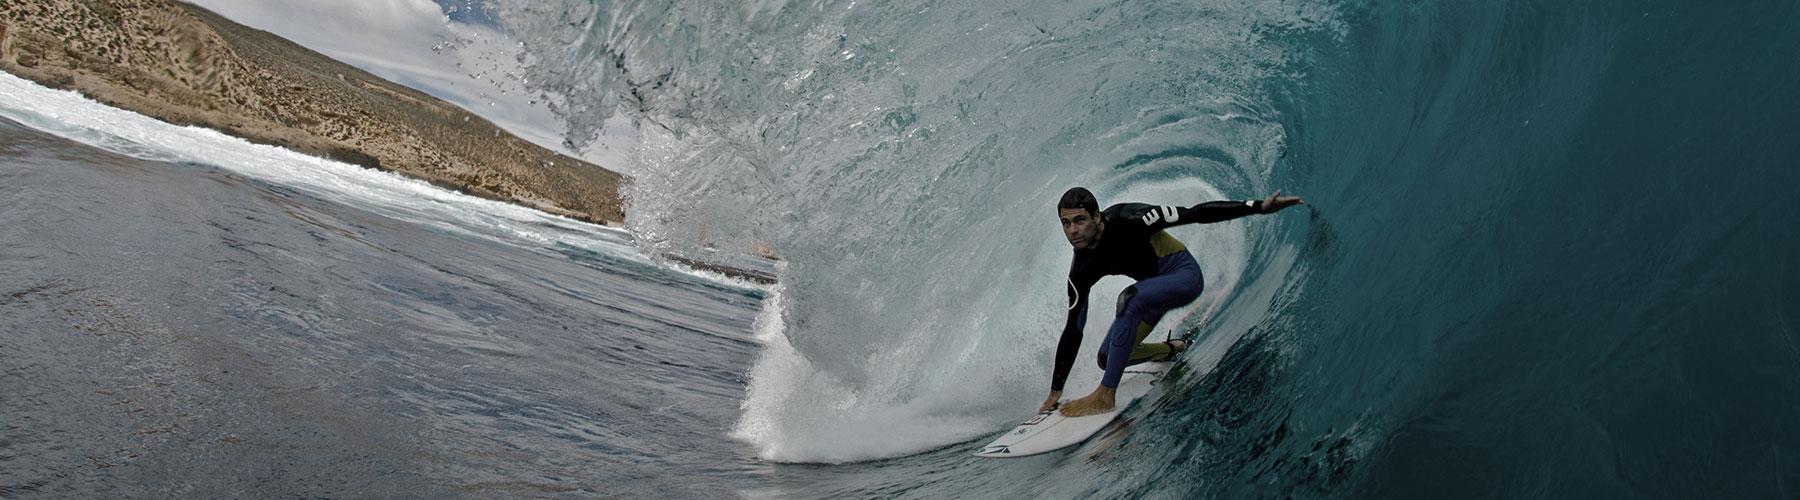 Kalbarri Surfboards